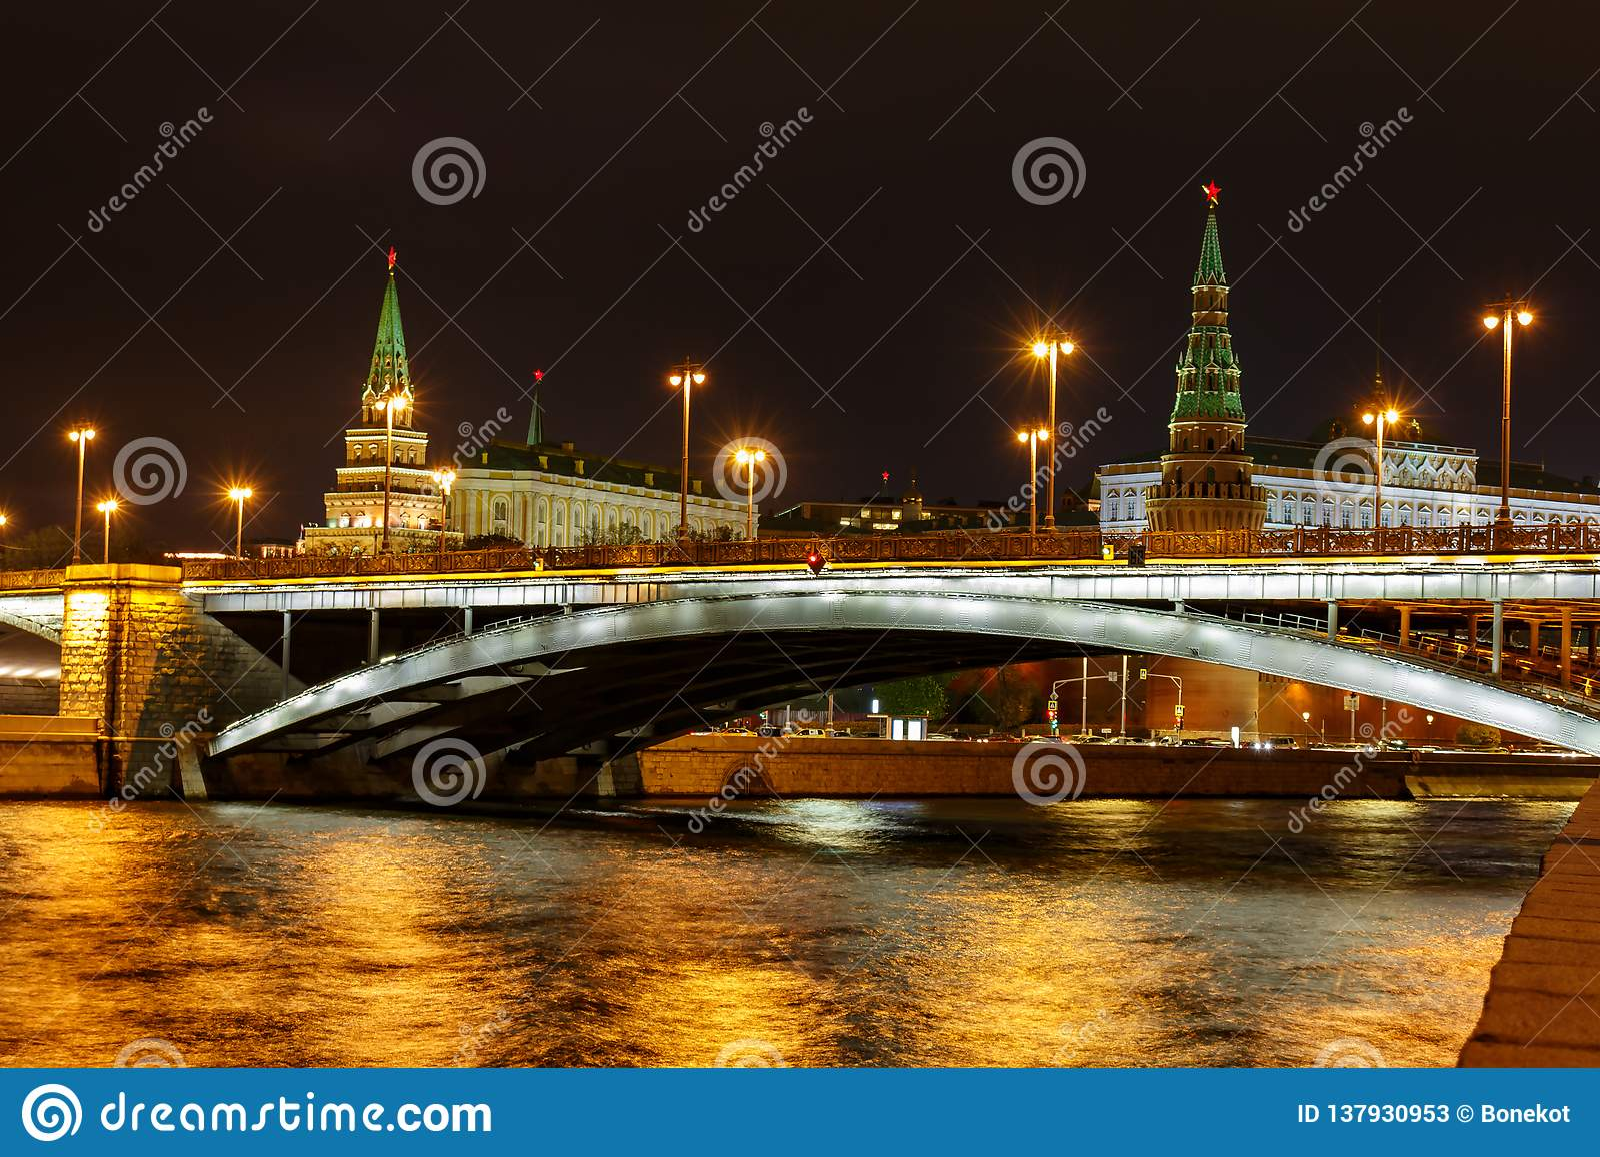 Bolshoy Kamenny Bridge on Moskva river against Moscow Kremlin towers